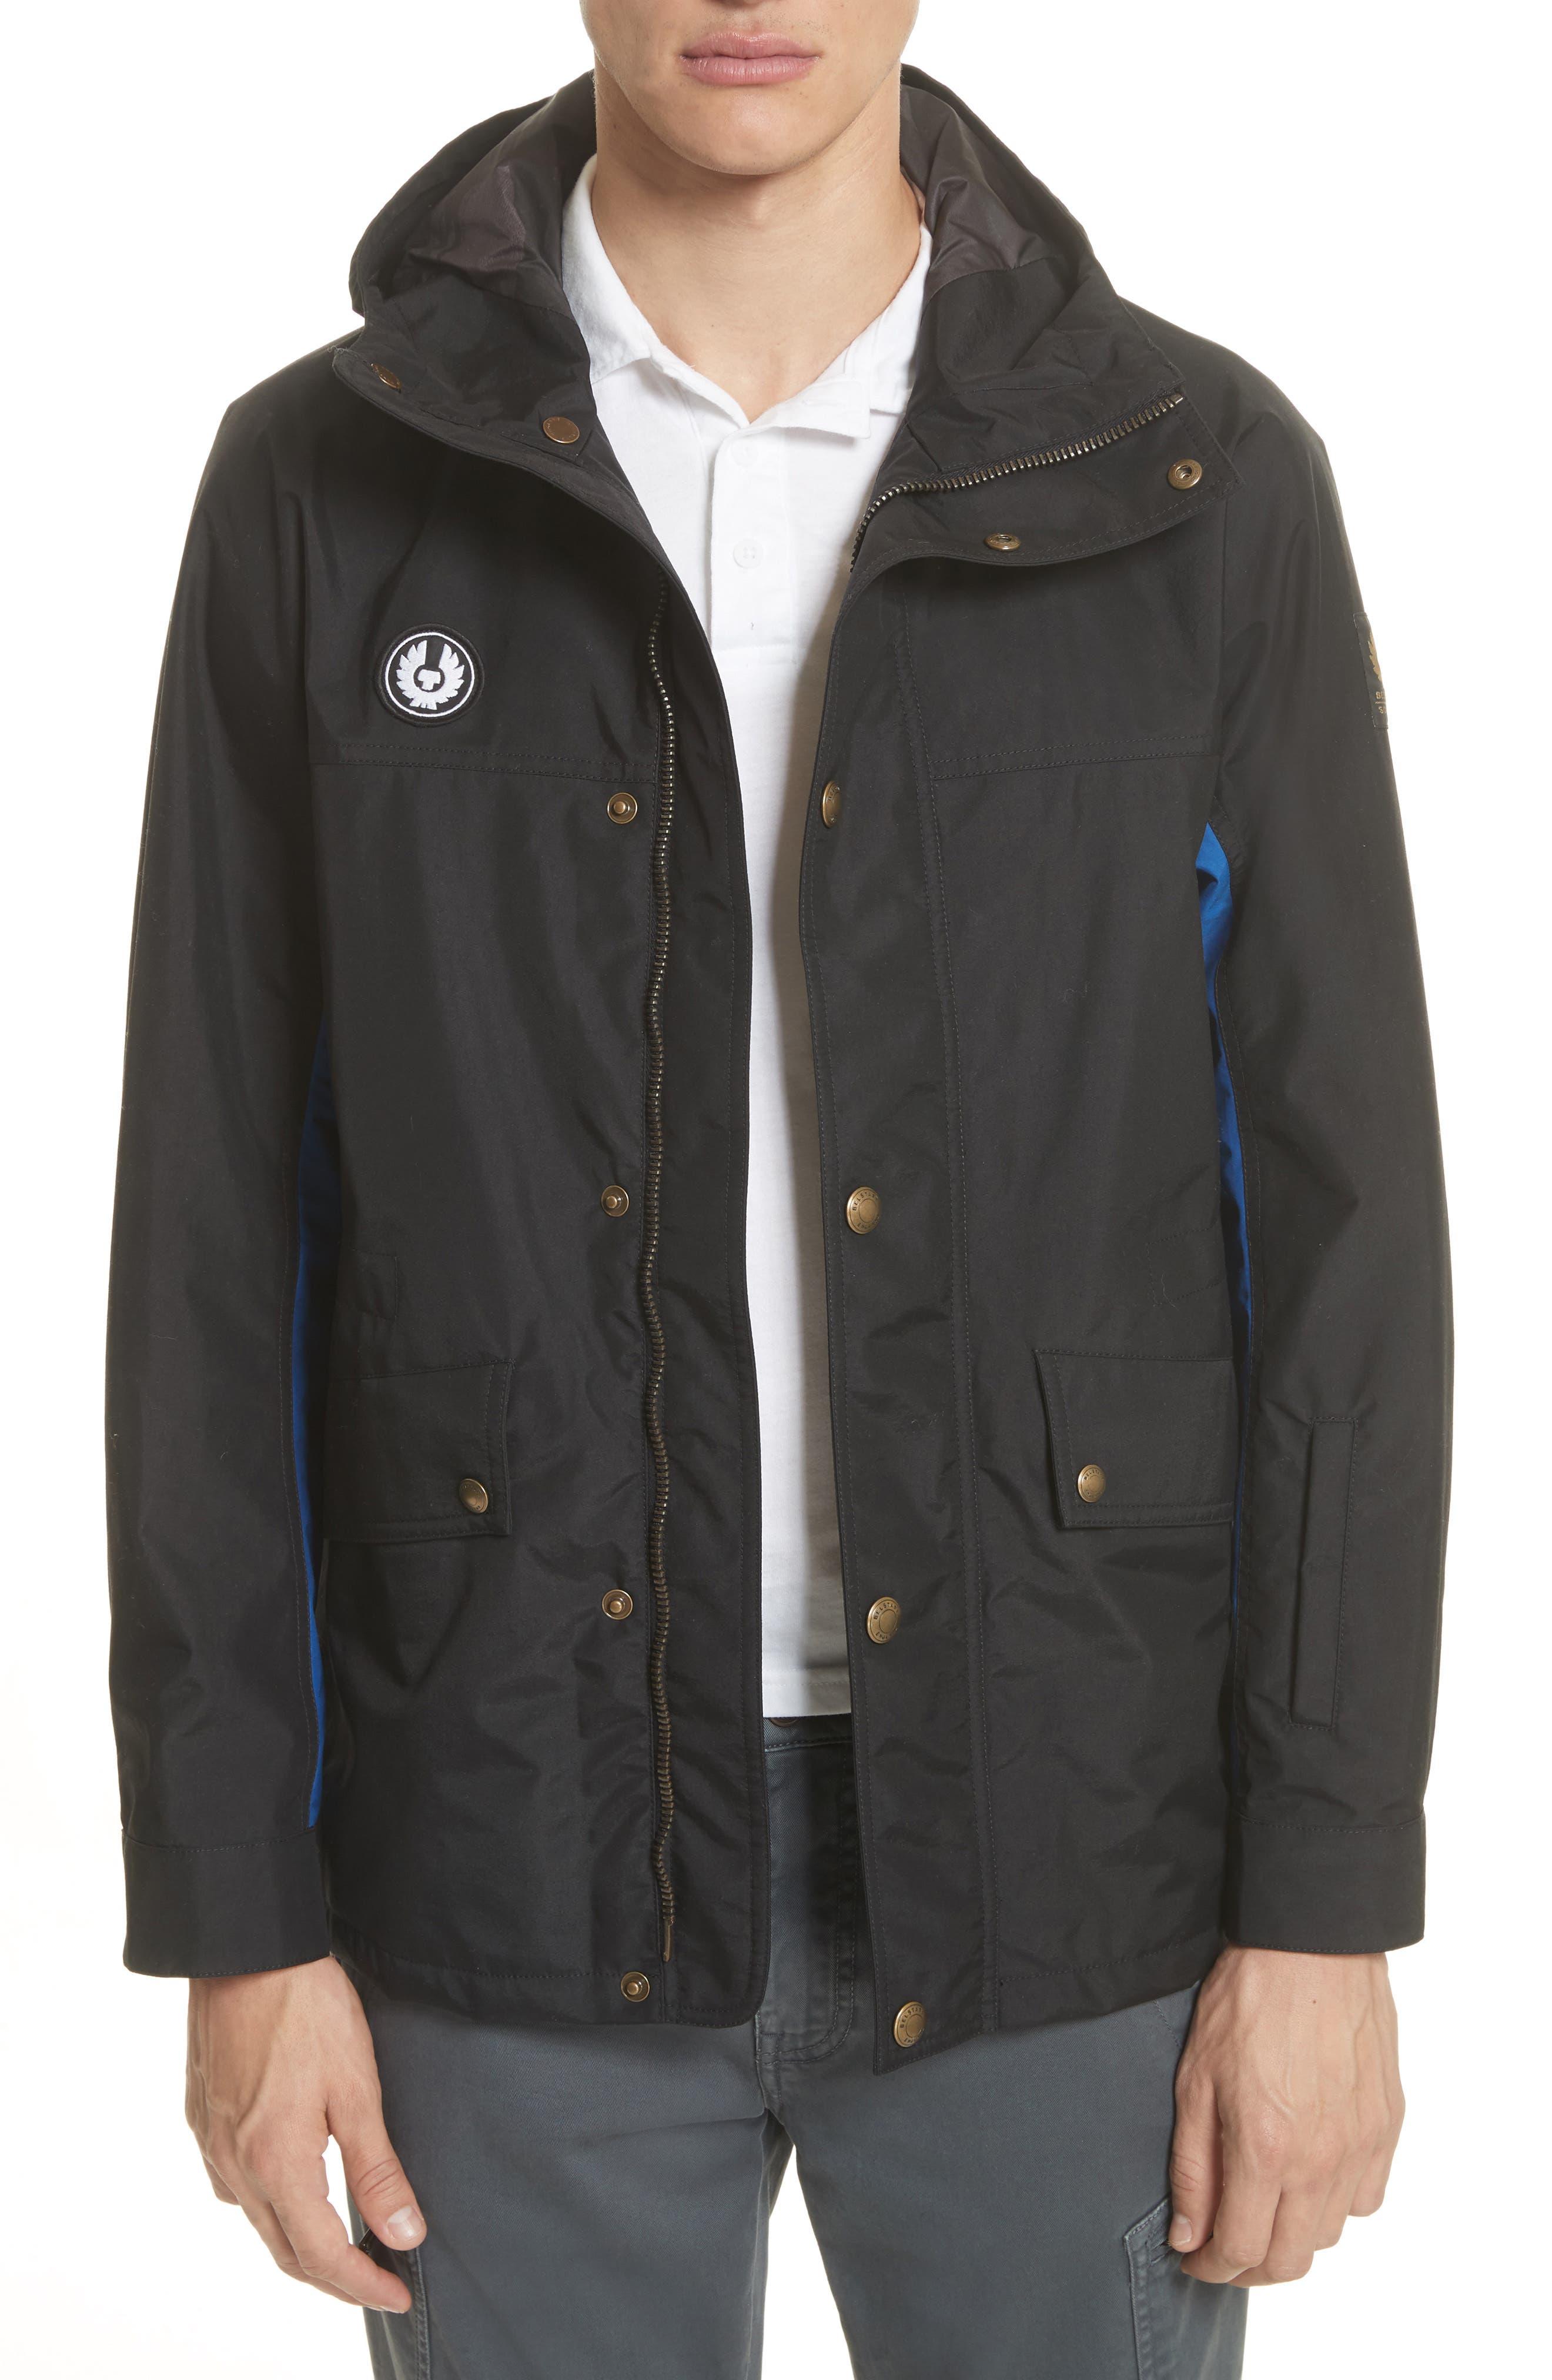 Kersbrook BXS Nylon Jacket,                             Main thumbnail 1, color,                             Black